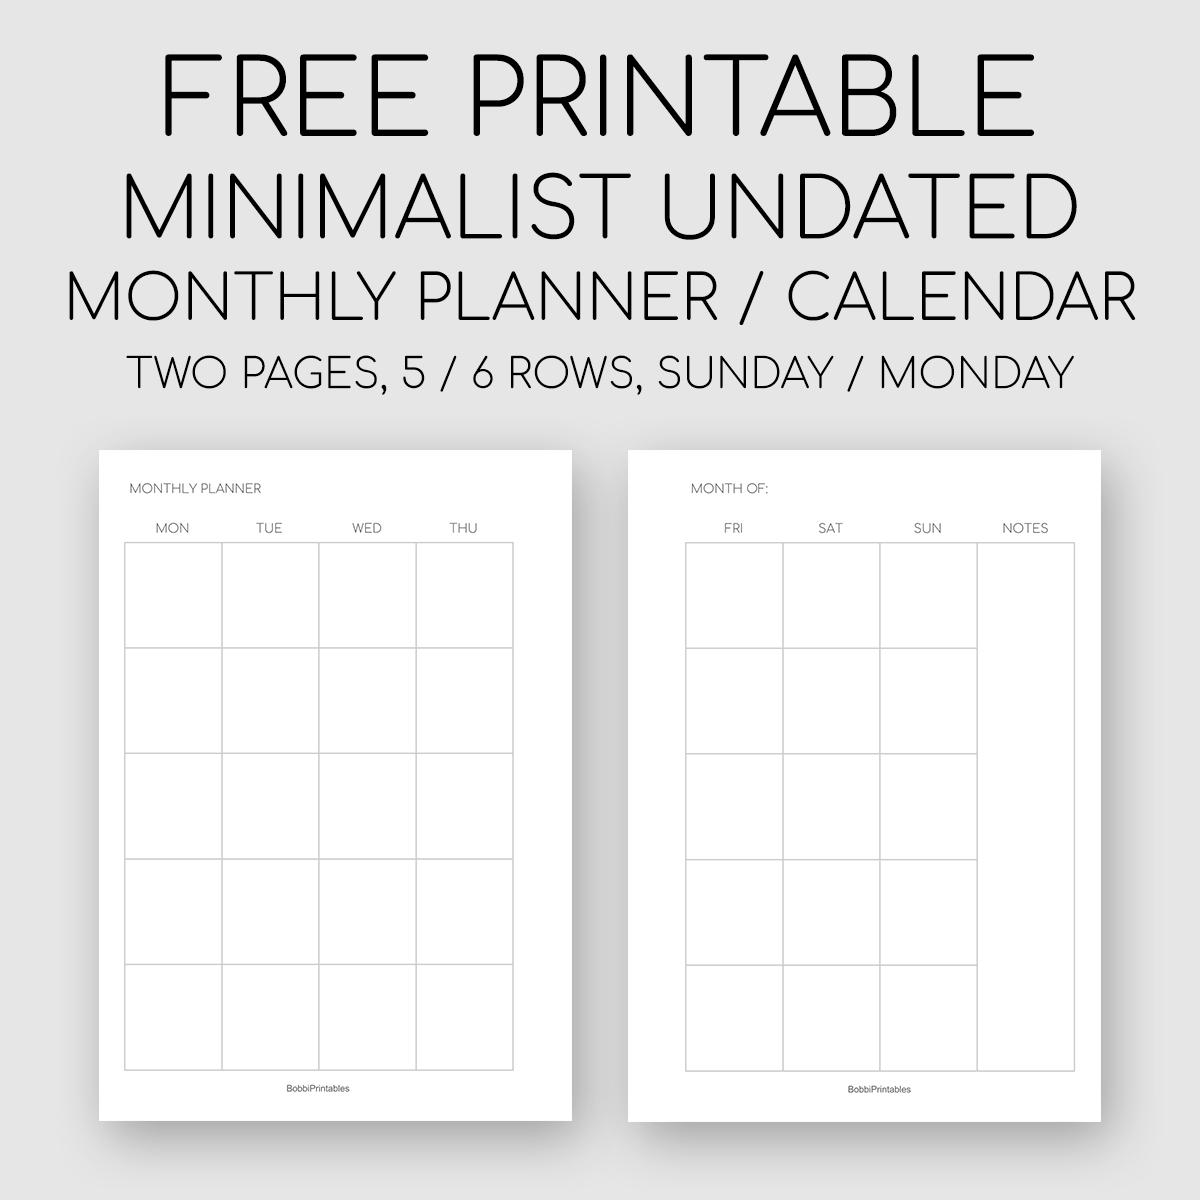 Free Printable Minimalist Monthly Planner / Undated Calendar with Undated Free Monthly Calendar Printable Free